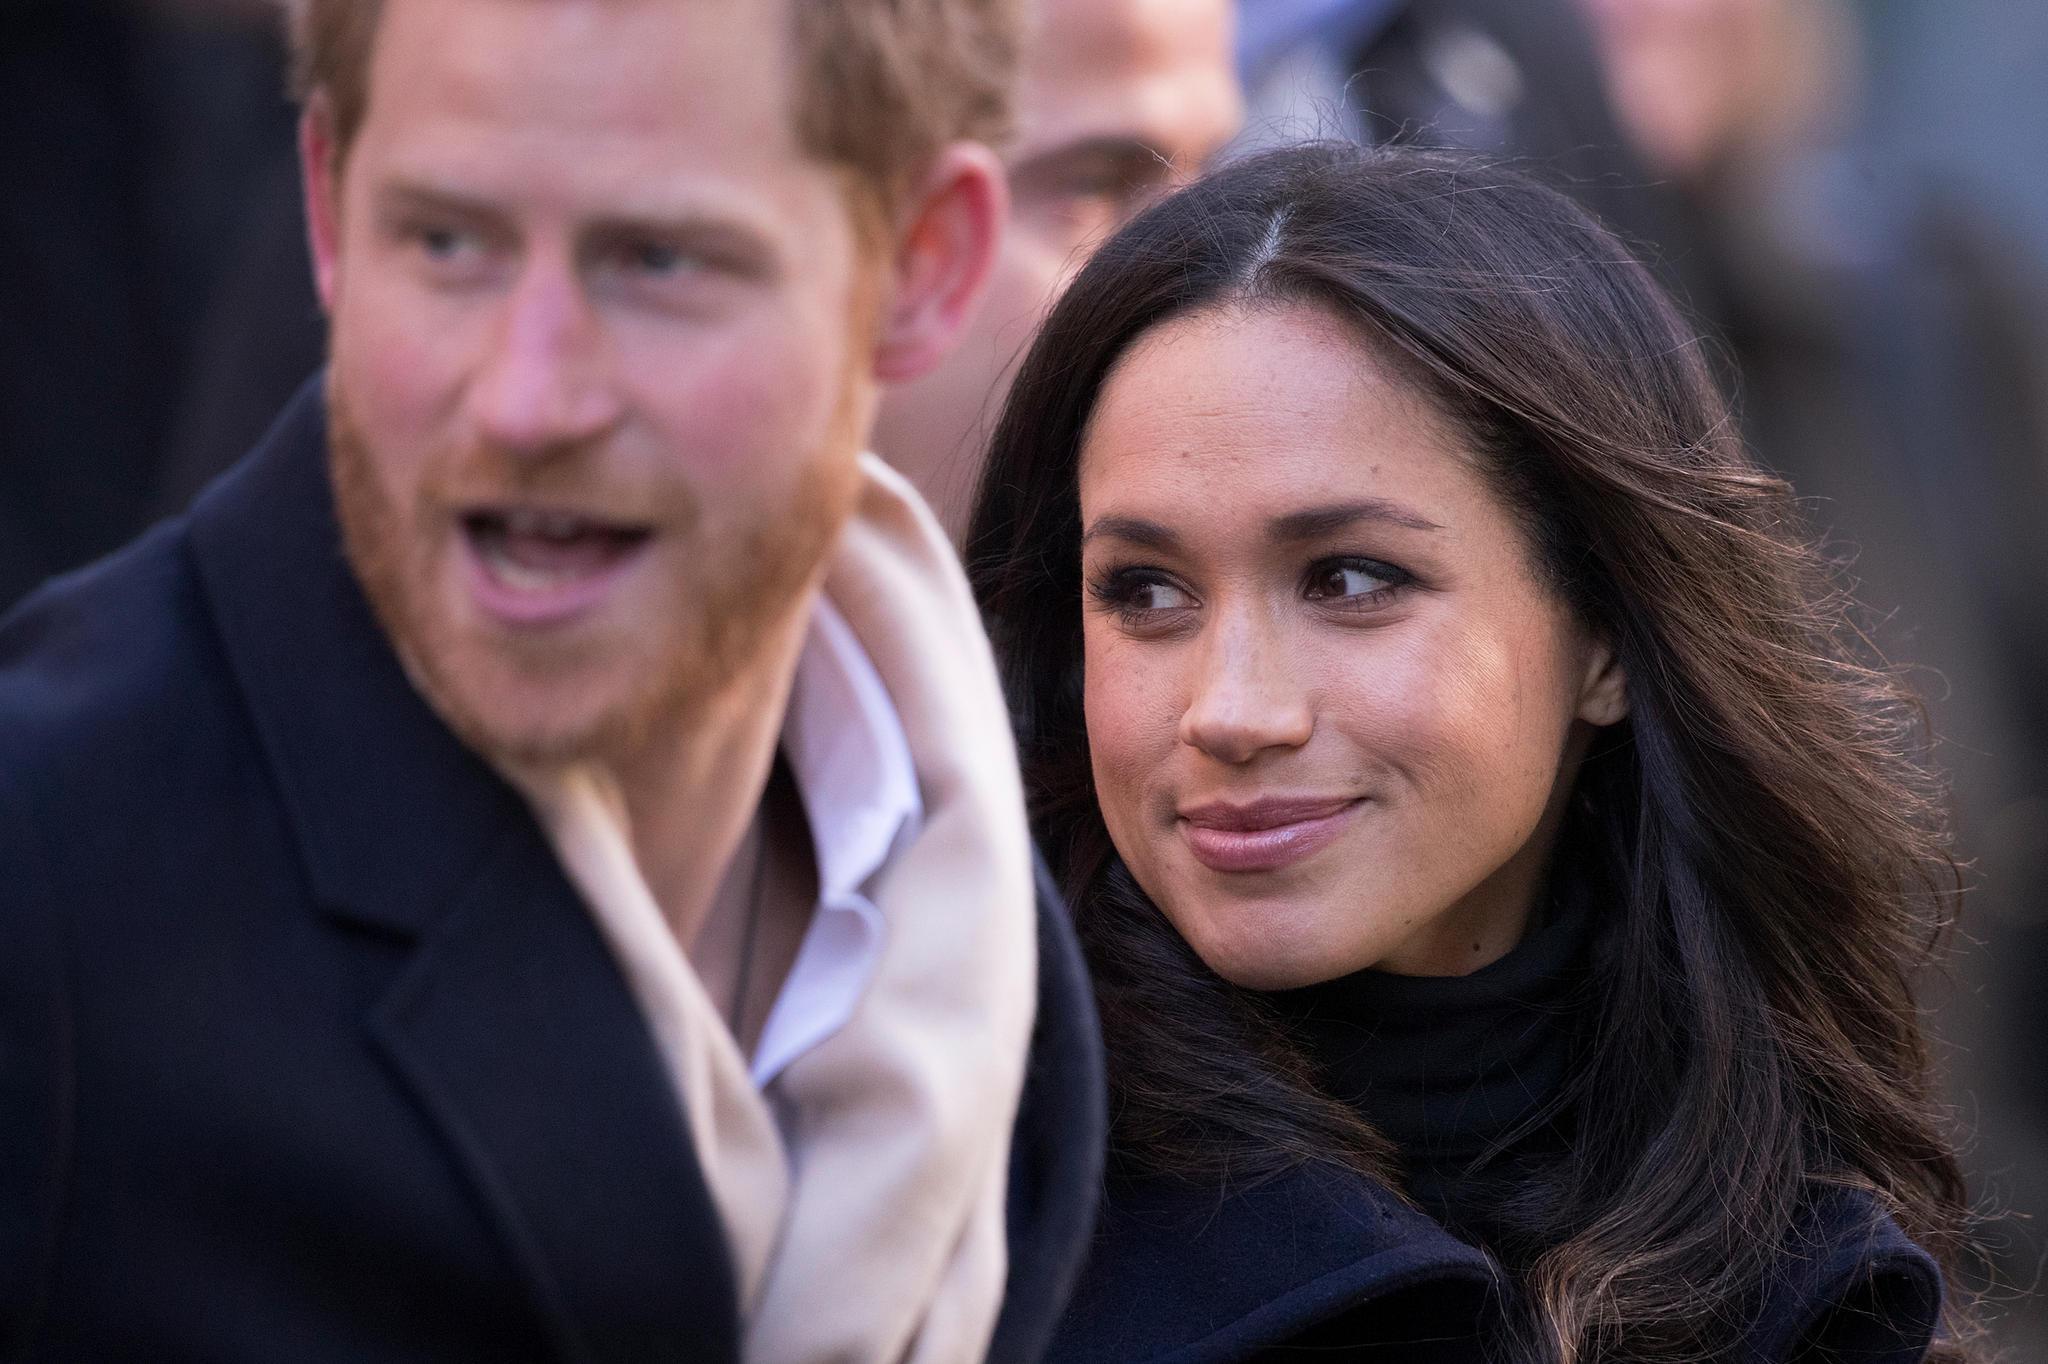 Sensation: Meghan Markle feiert Weihnachten mit der Queen | STERN.de